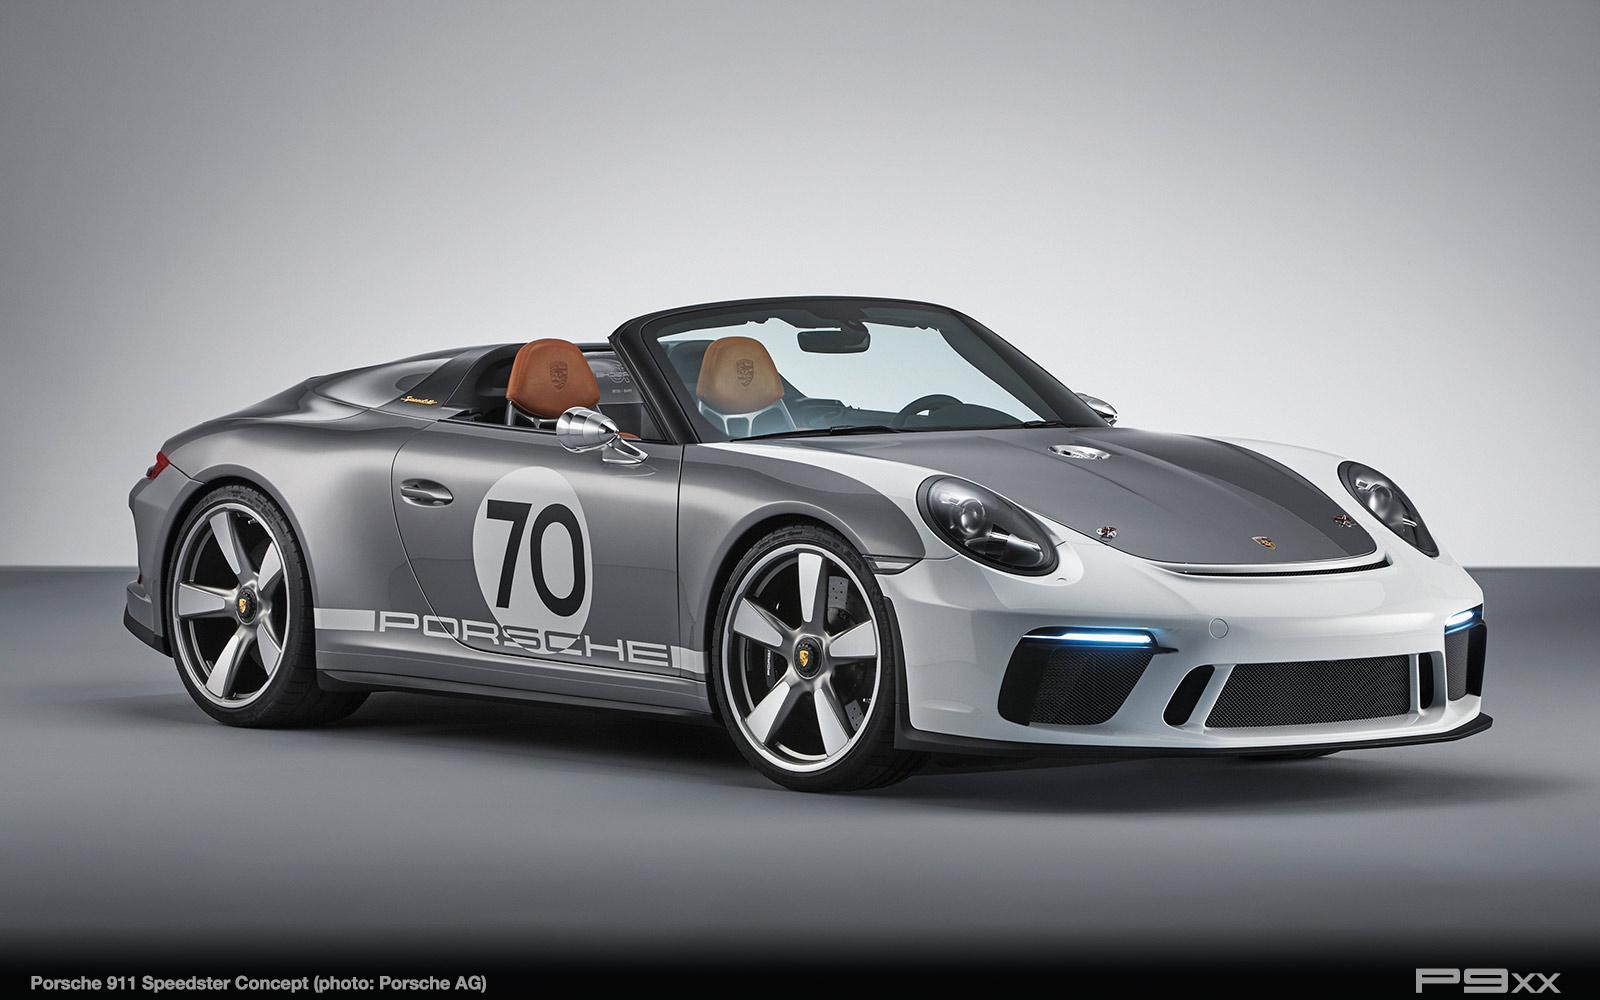 Porsche-911-Speedster-Concept-2018-300